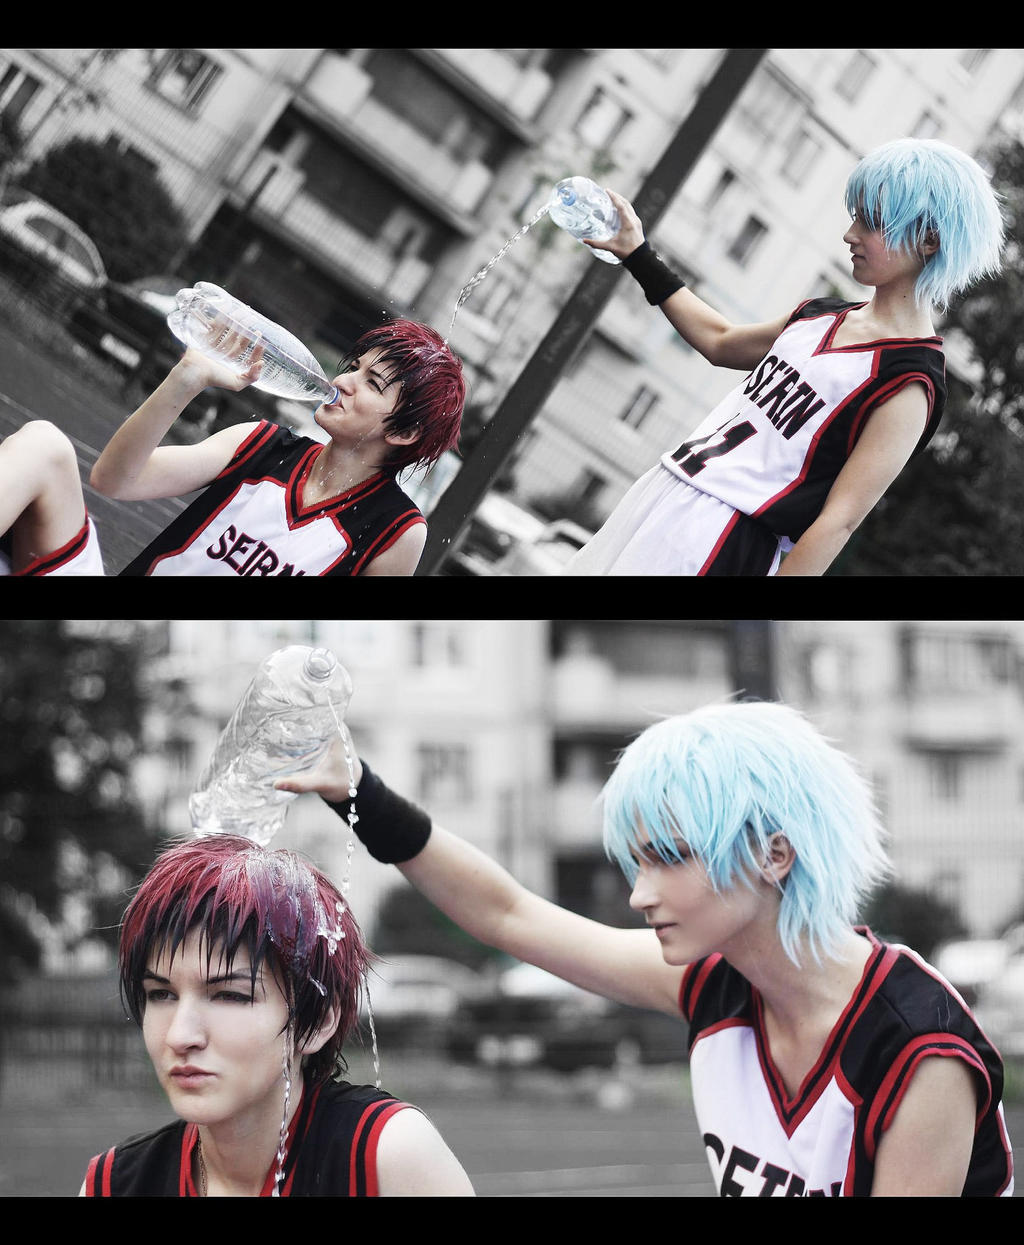 Kagami-kun, do you want water?